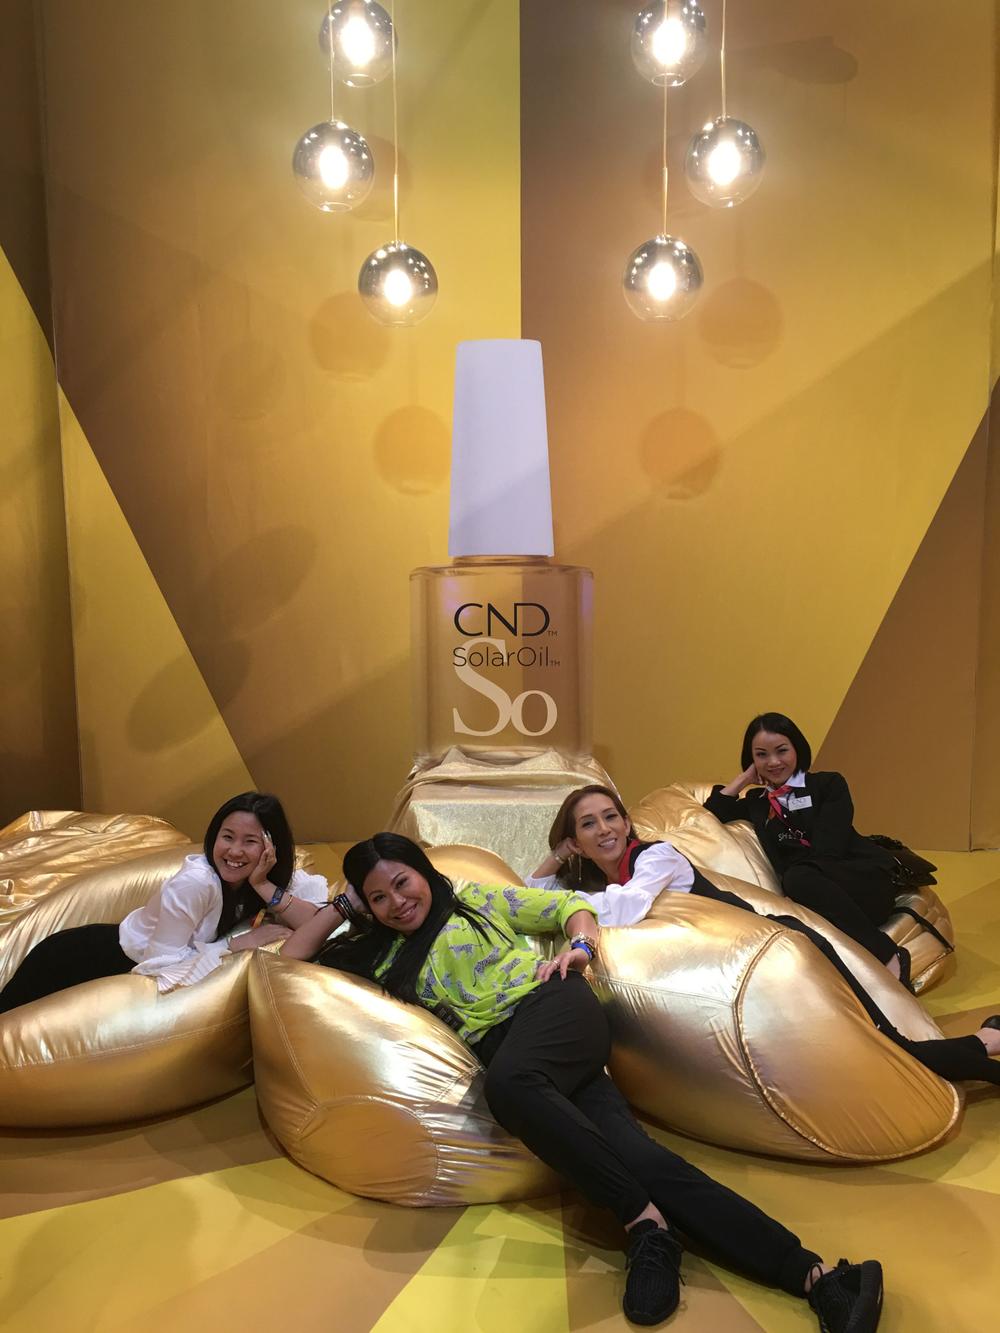 <p>CND solar oil room</p>